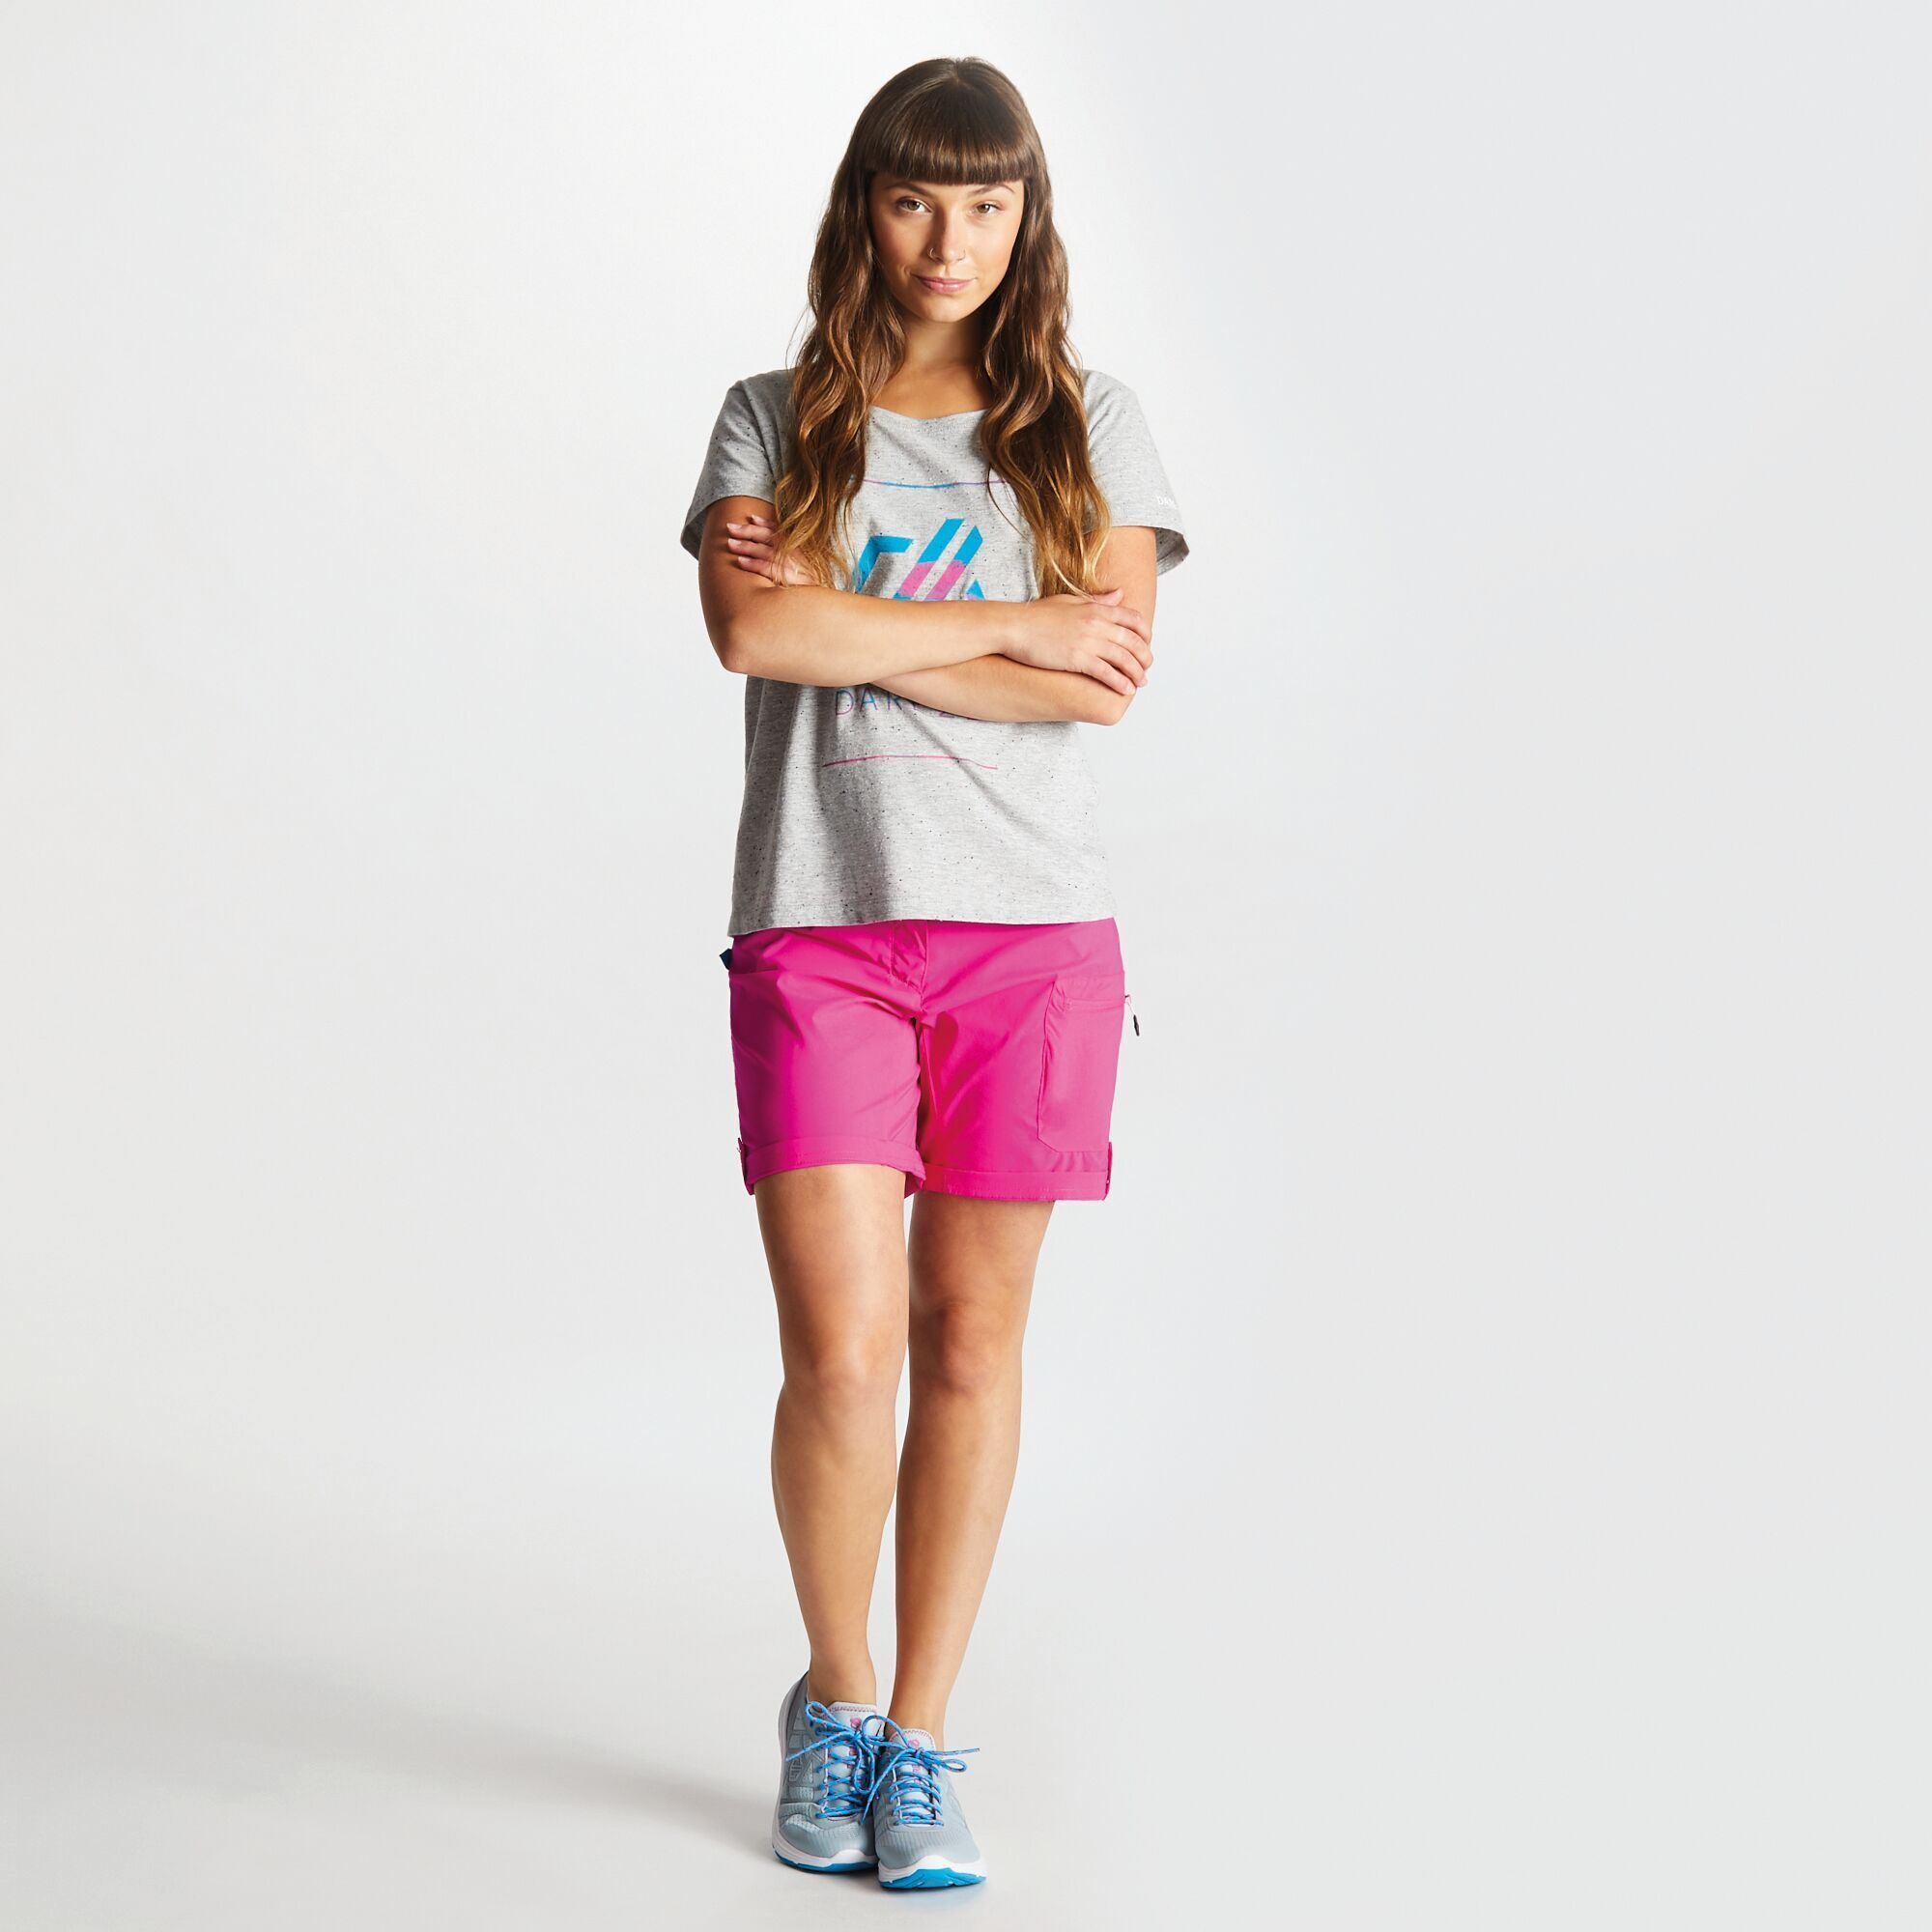 Dare2b Womens/Ladies Melodic II Multi Pocket Walking Shorts (16 UK) (Lunar Purple)